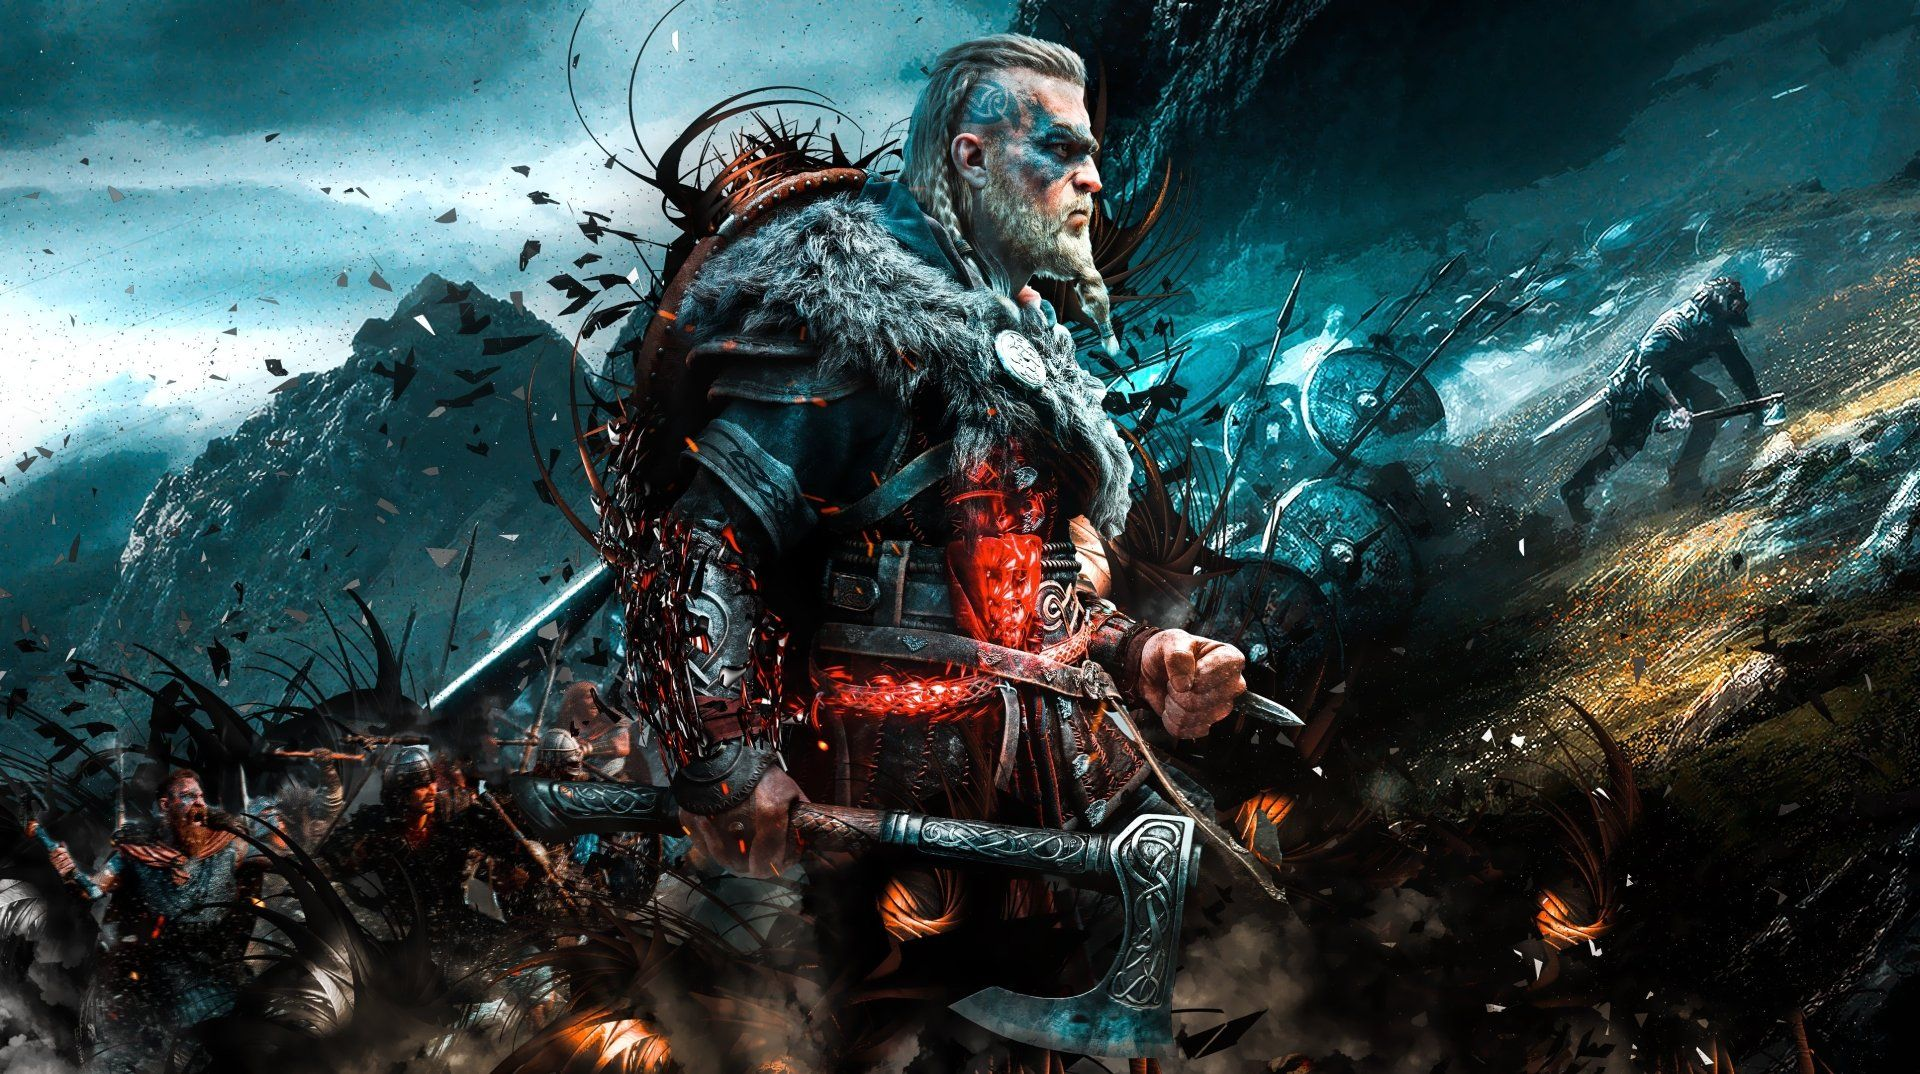 Despairdiamond Shop Redbubble Assassin S Creed Wallpaper Assassins Creed Gaming Wallpapers Hd